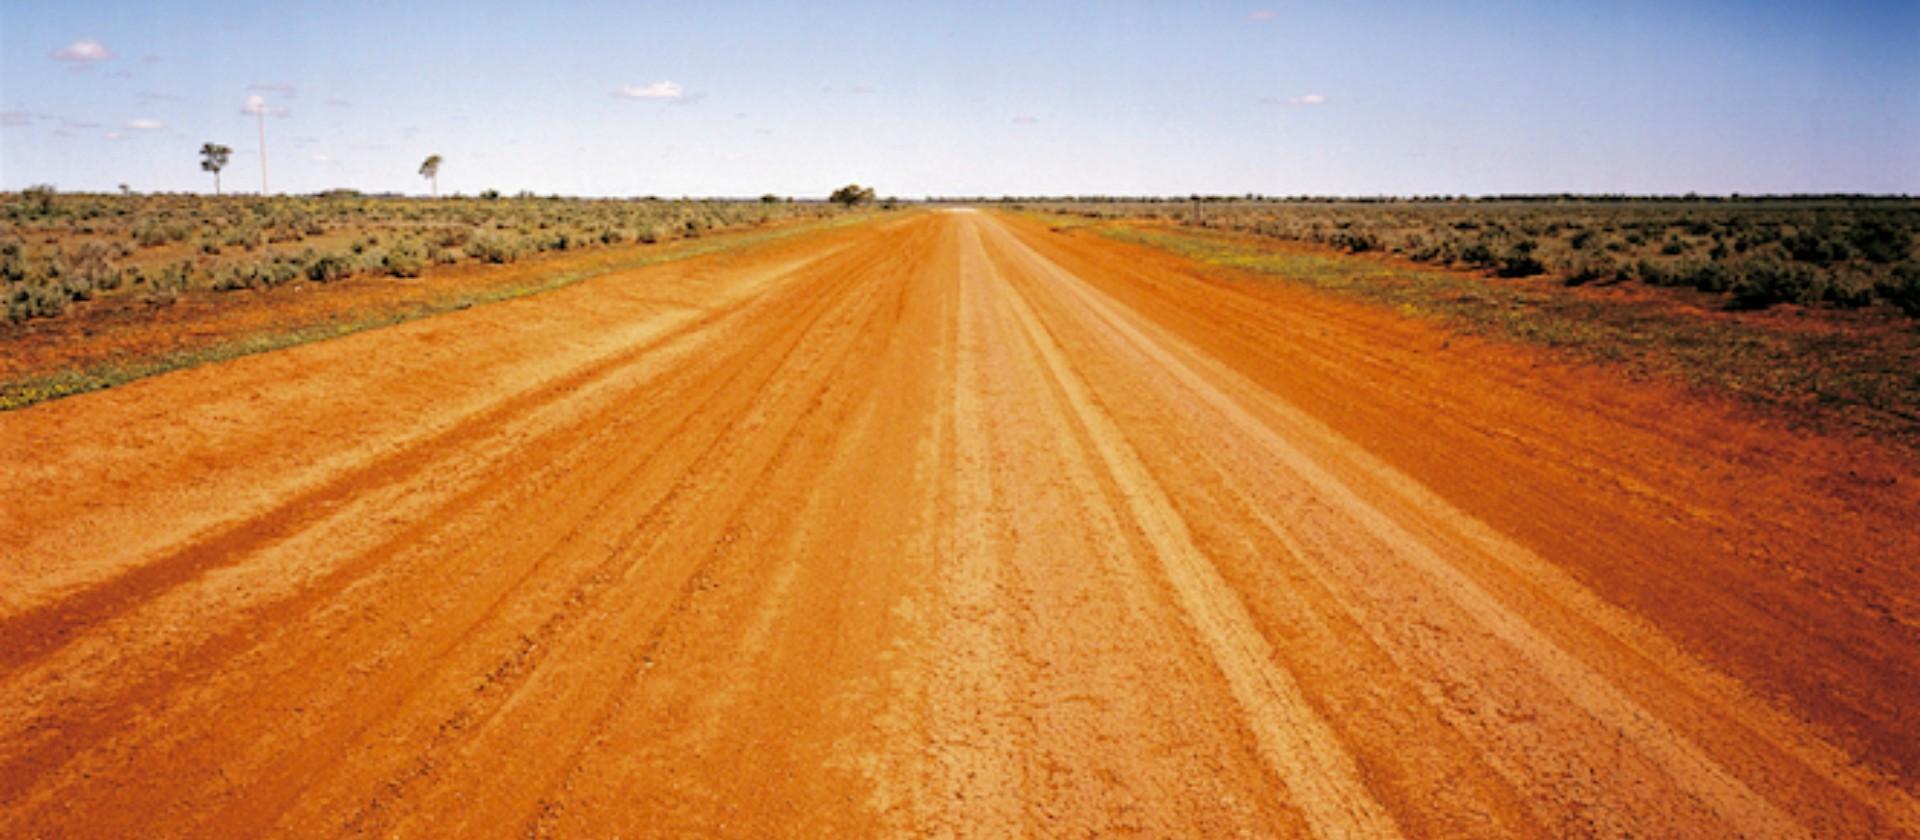 Red dirt road at Mundi Mundi Near Broken Hill